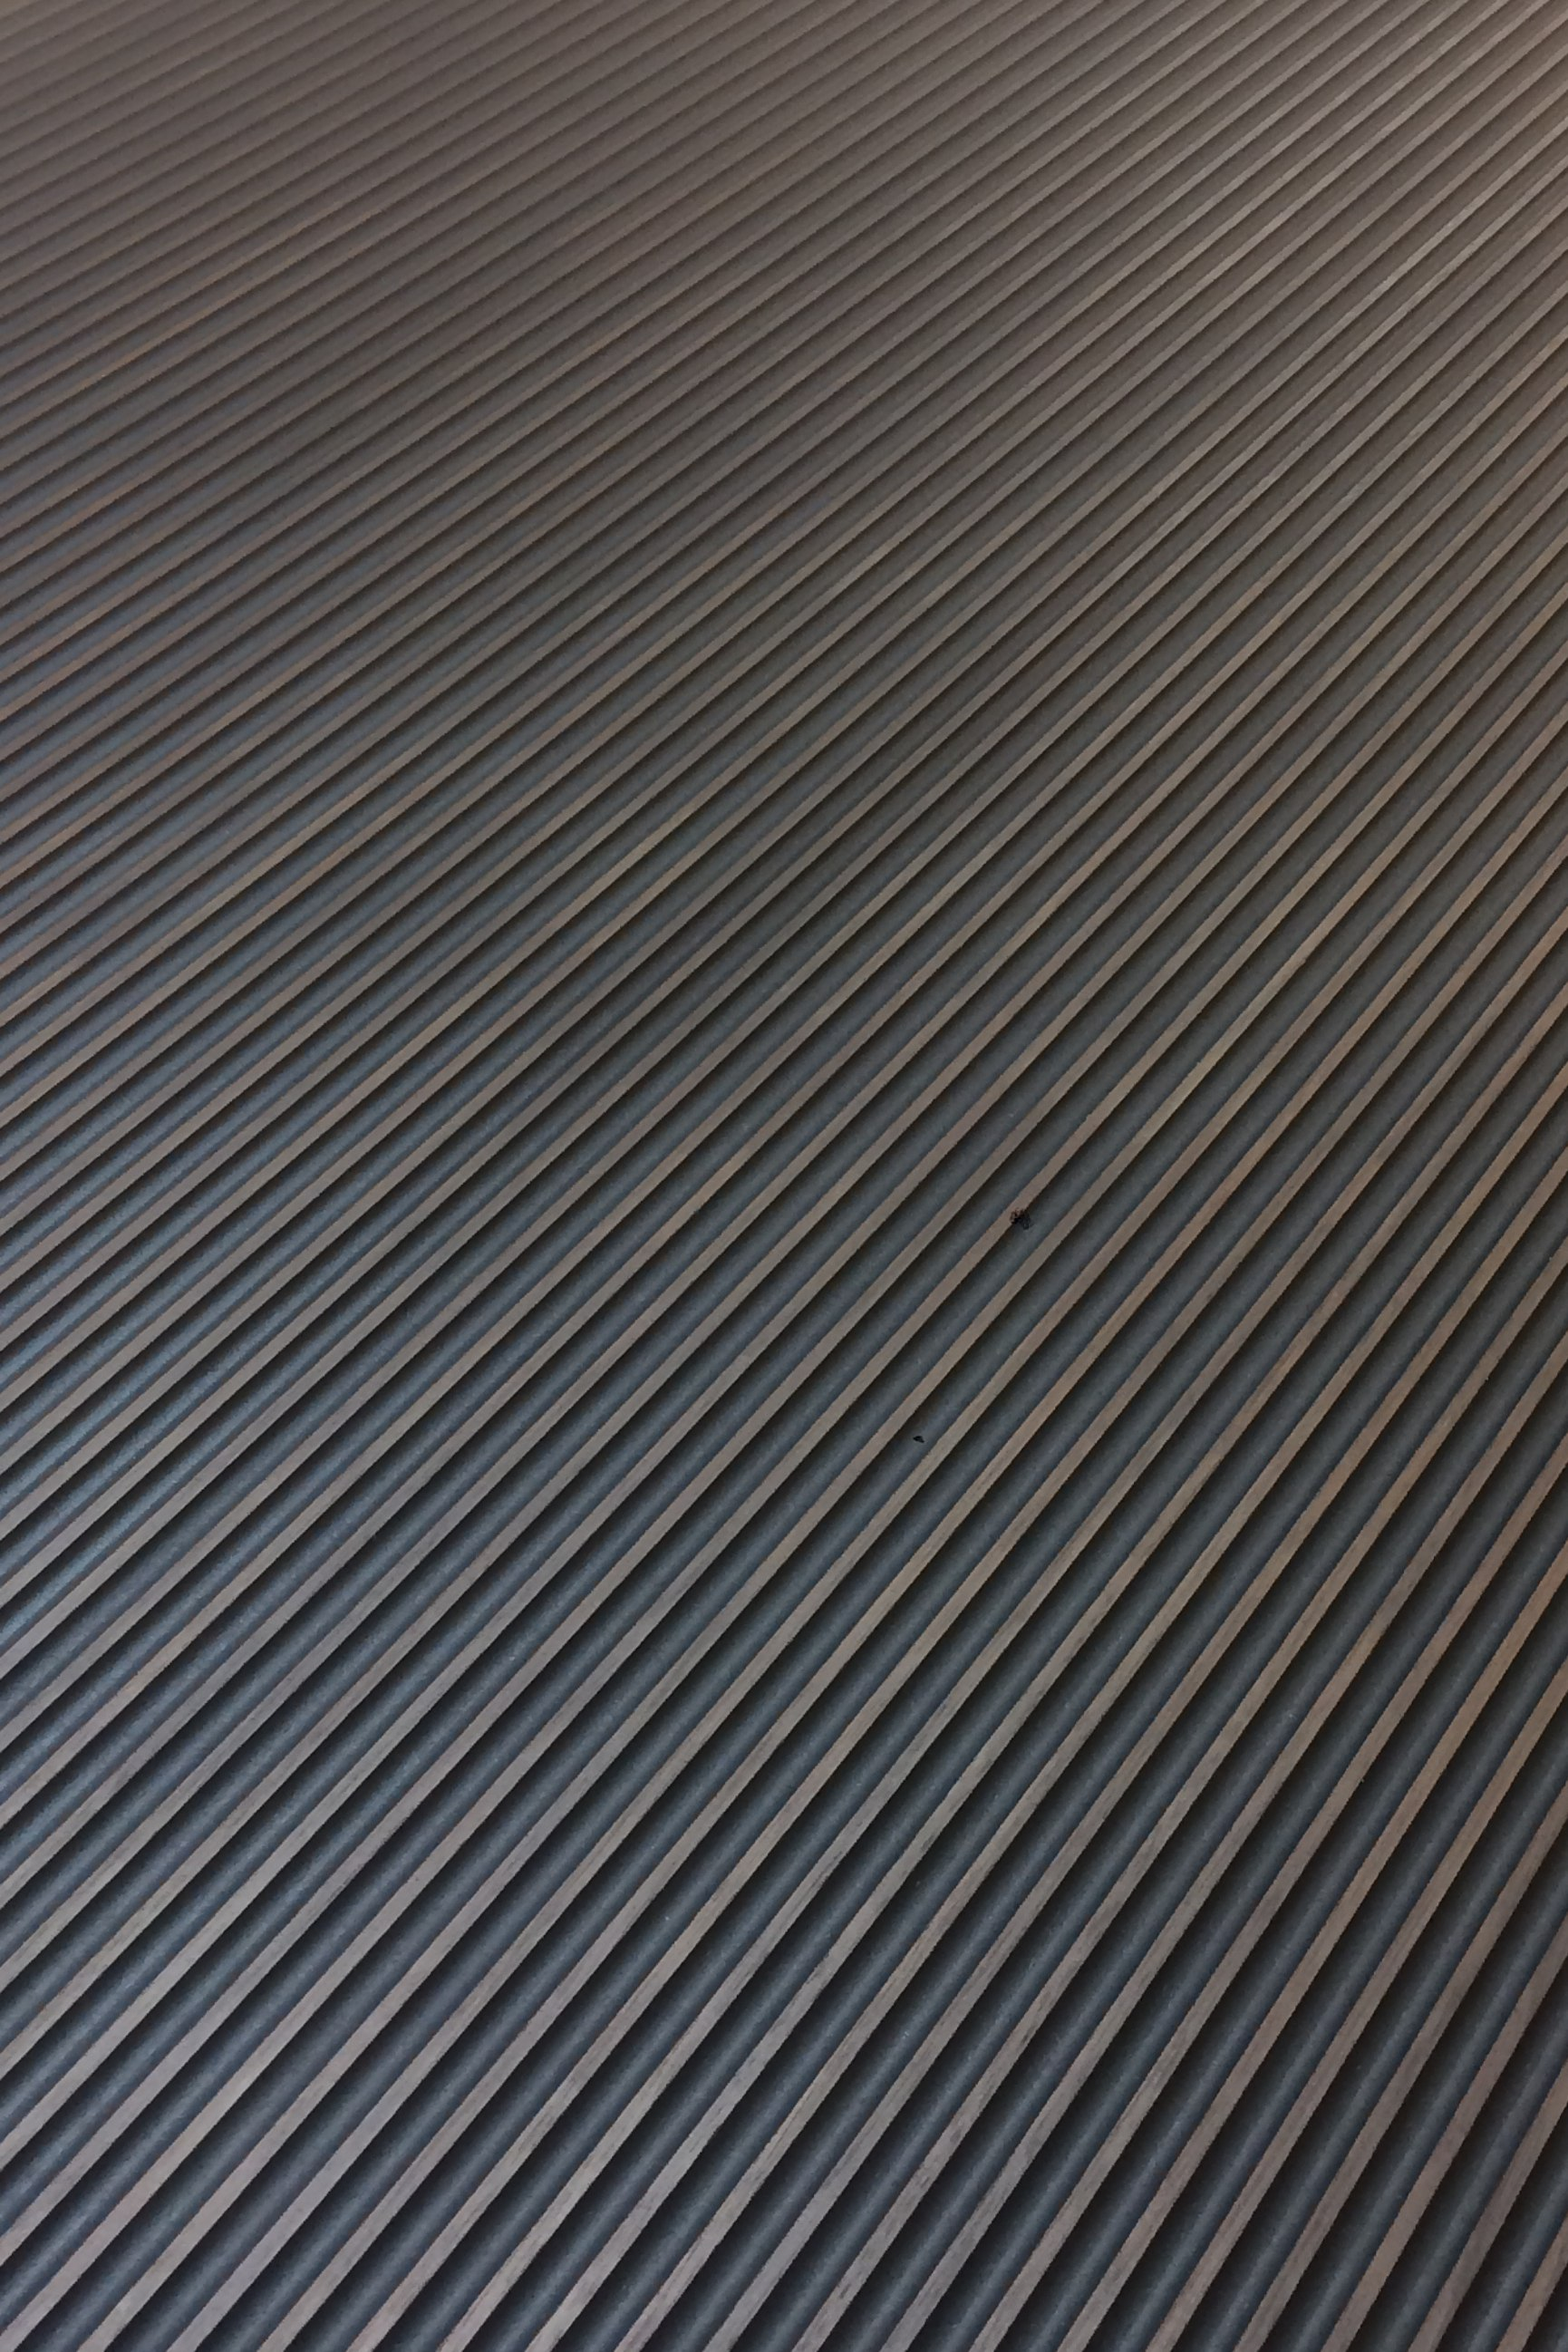 ScanWest Doors-PINSTRIPE-wall panel 1